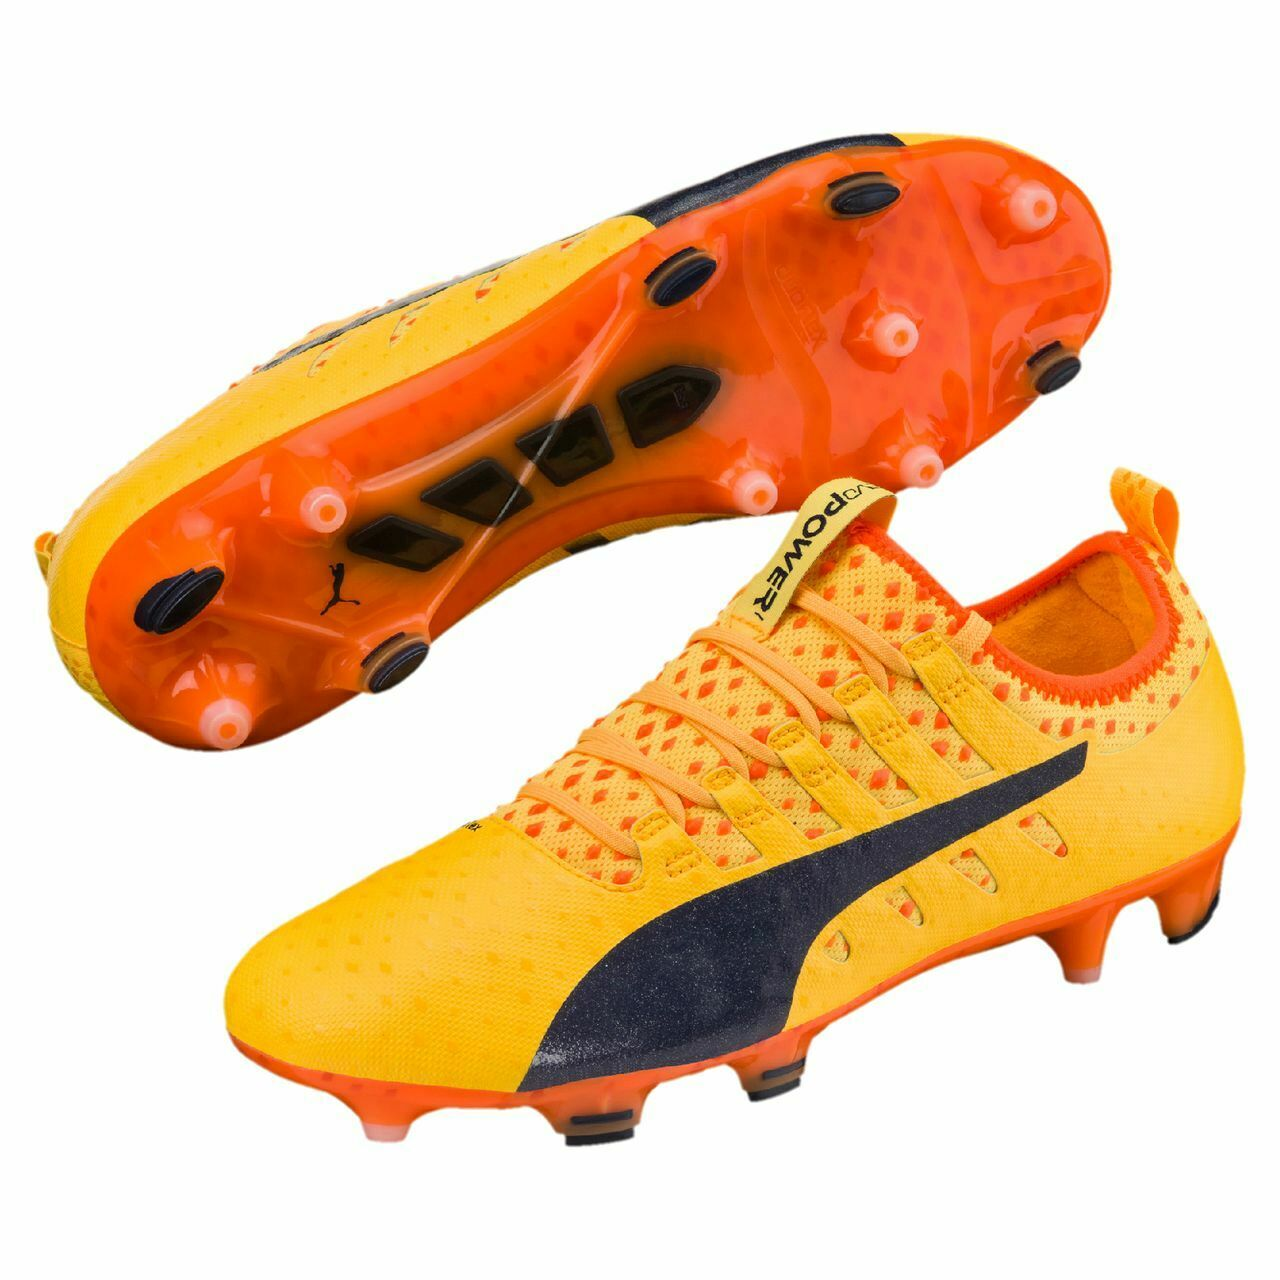 Puma Zapatos de Fútbol Evo Power Vigor 1 Fg 103824 07 Fútbol Hombre